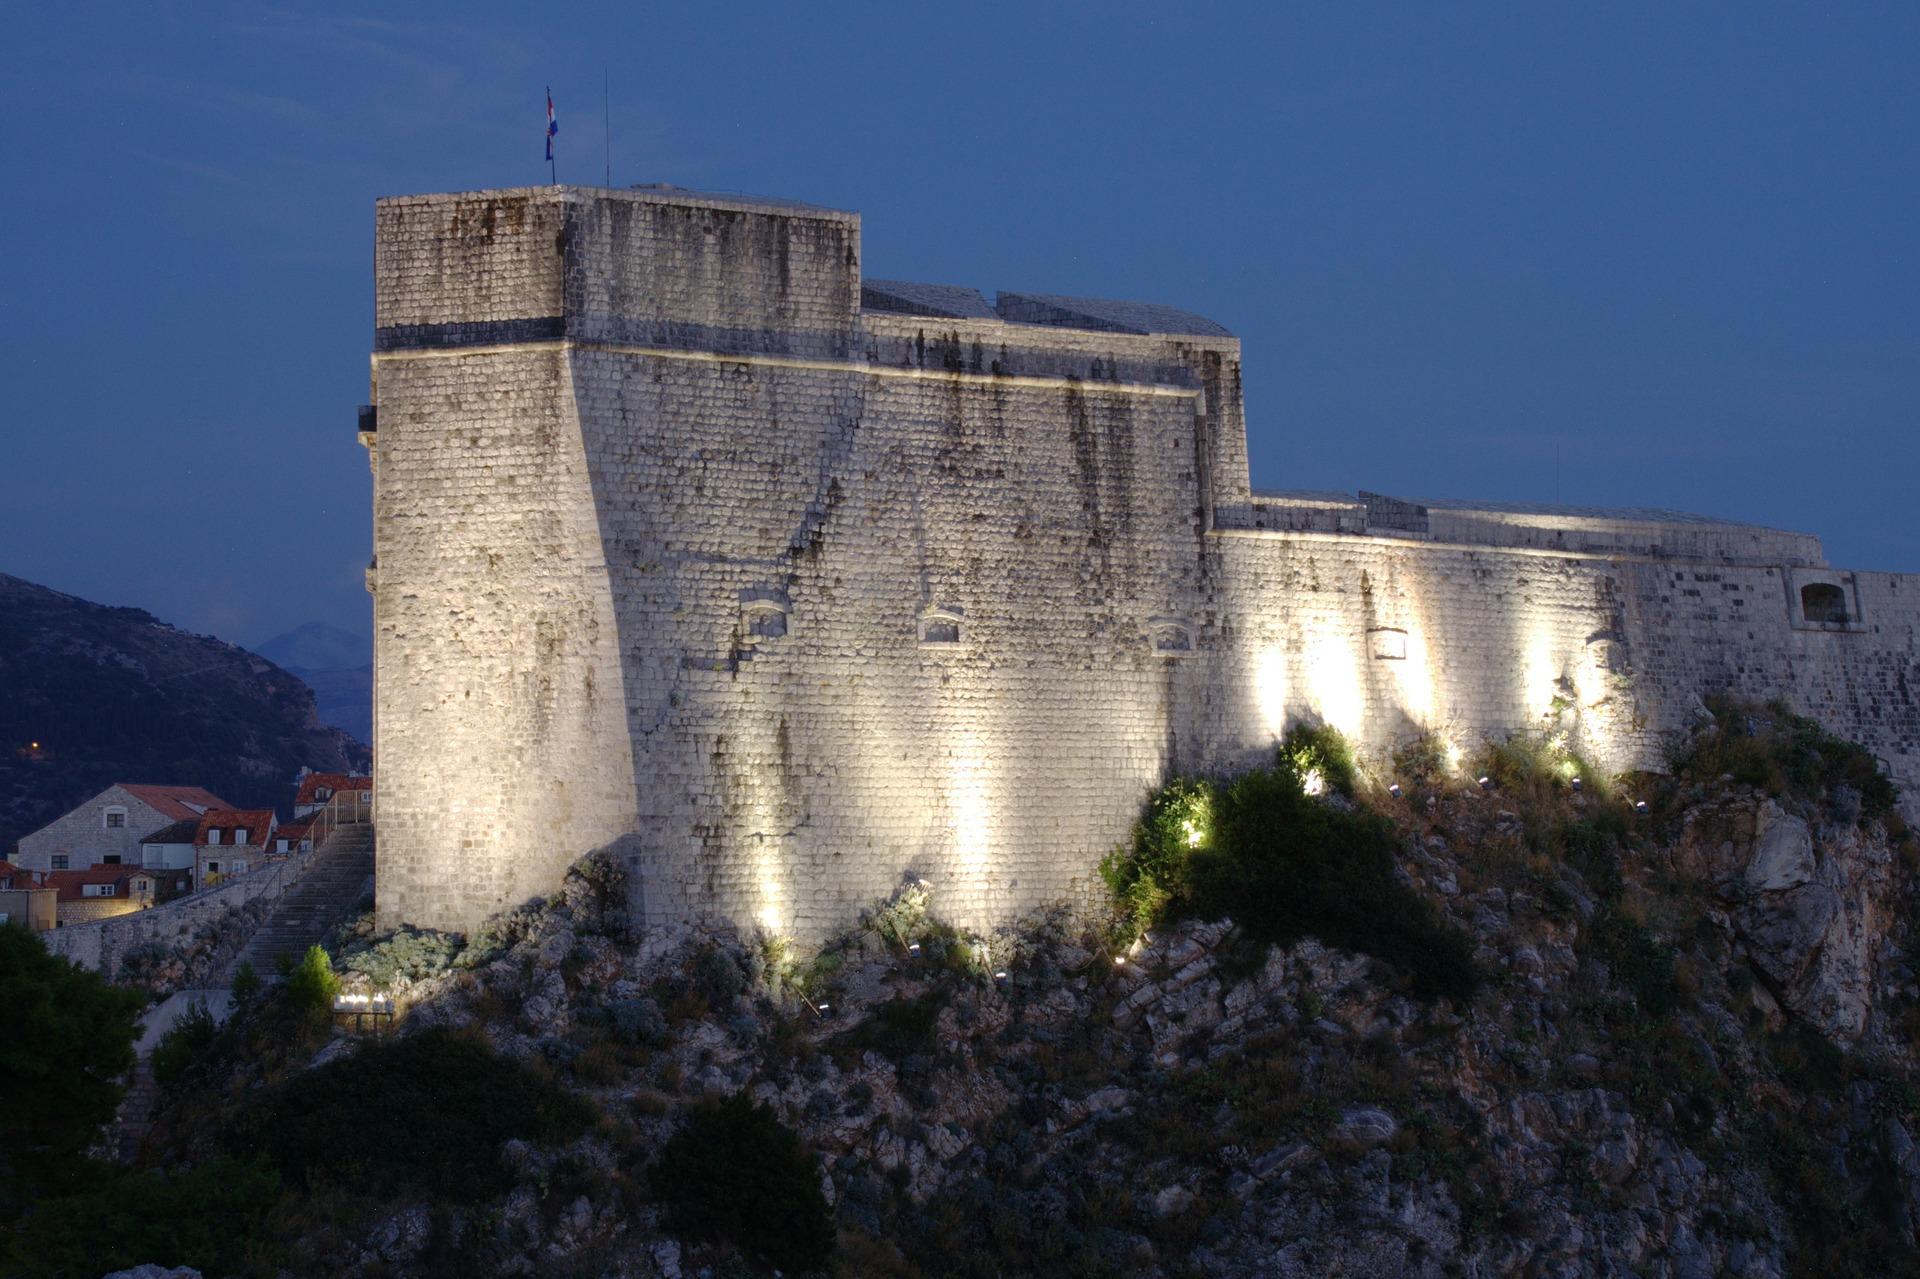 Festung Lovrijenac aka Rote Burgfried